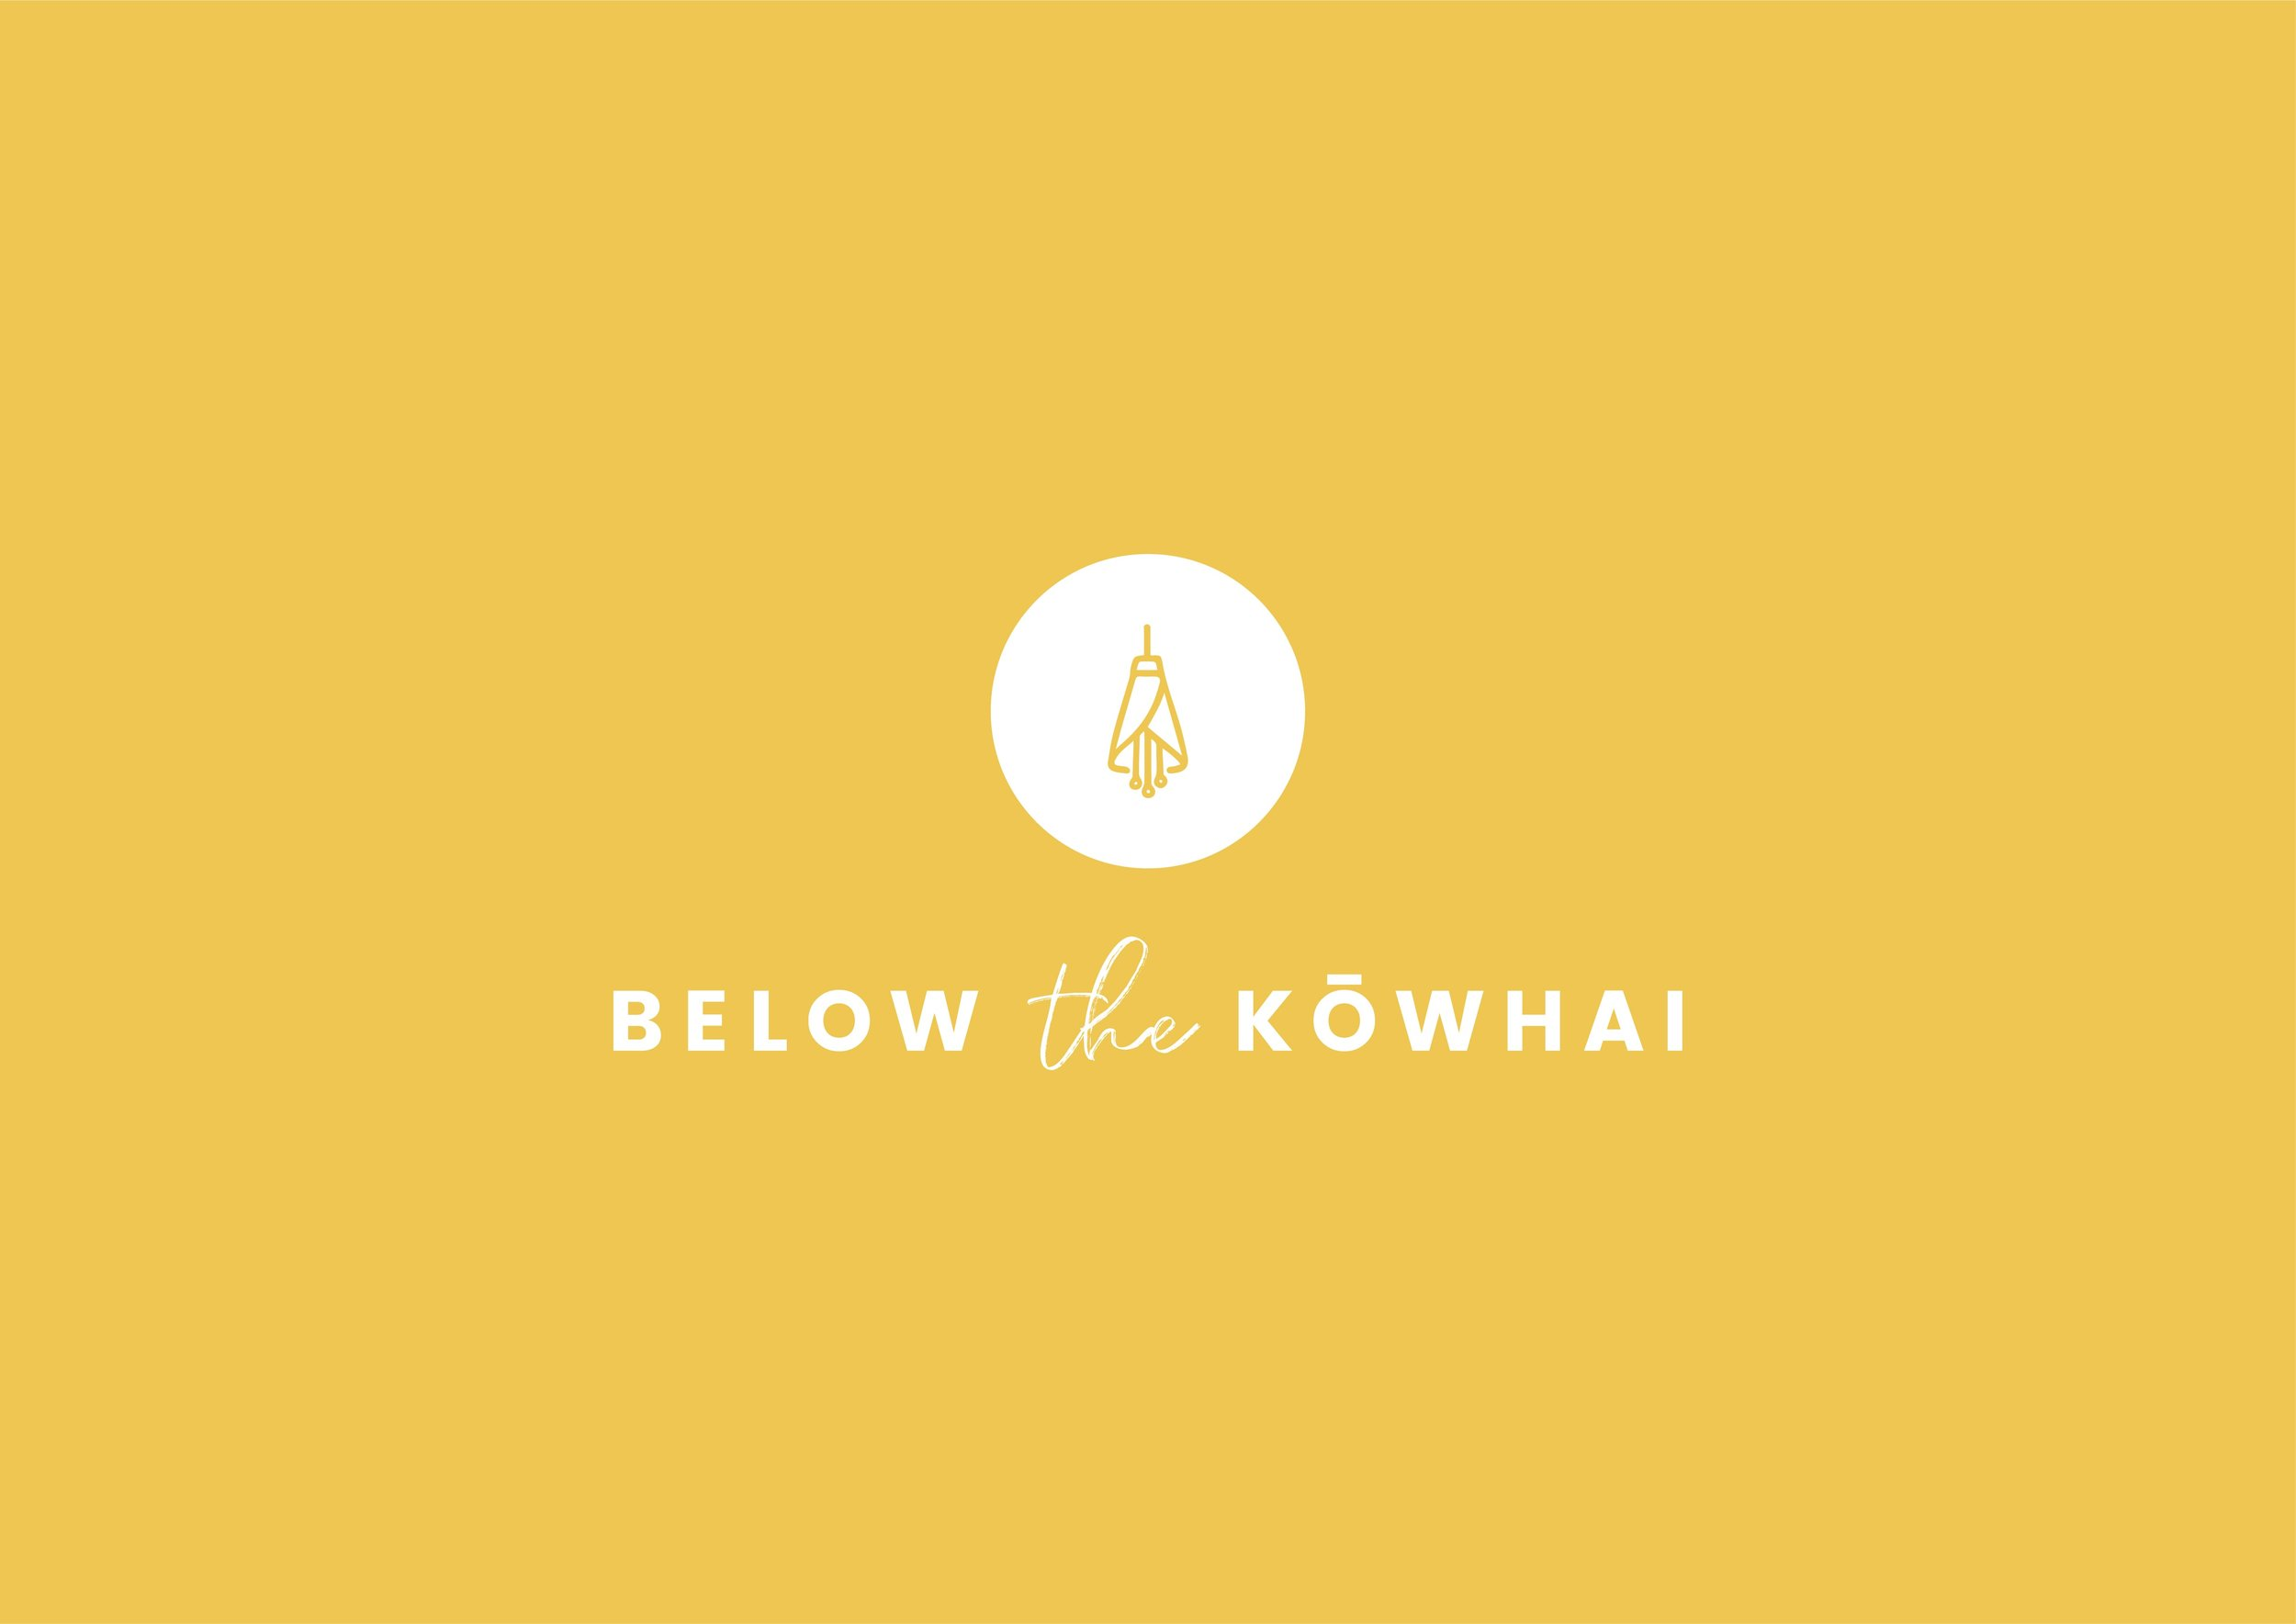 belowthekowhai-logo.jpg